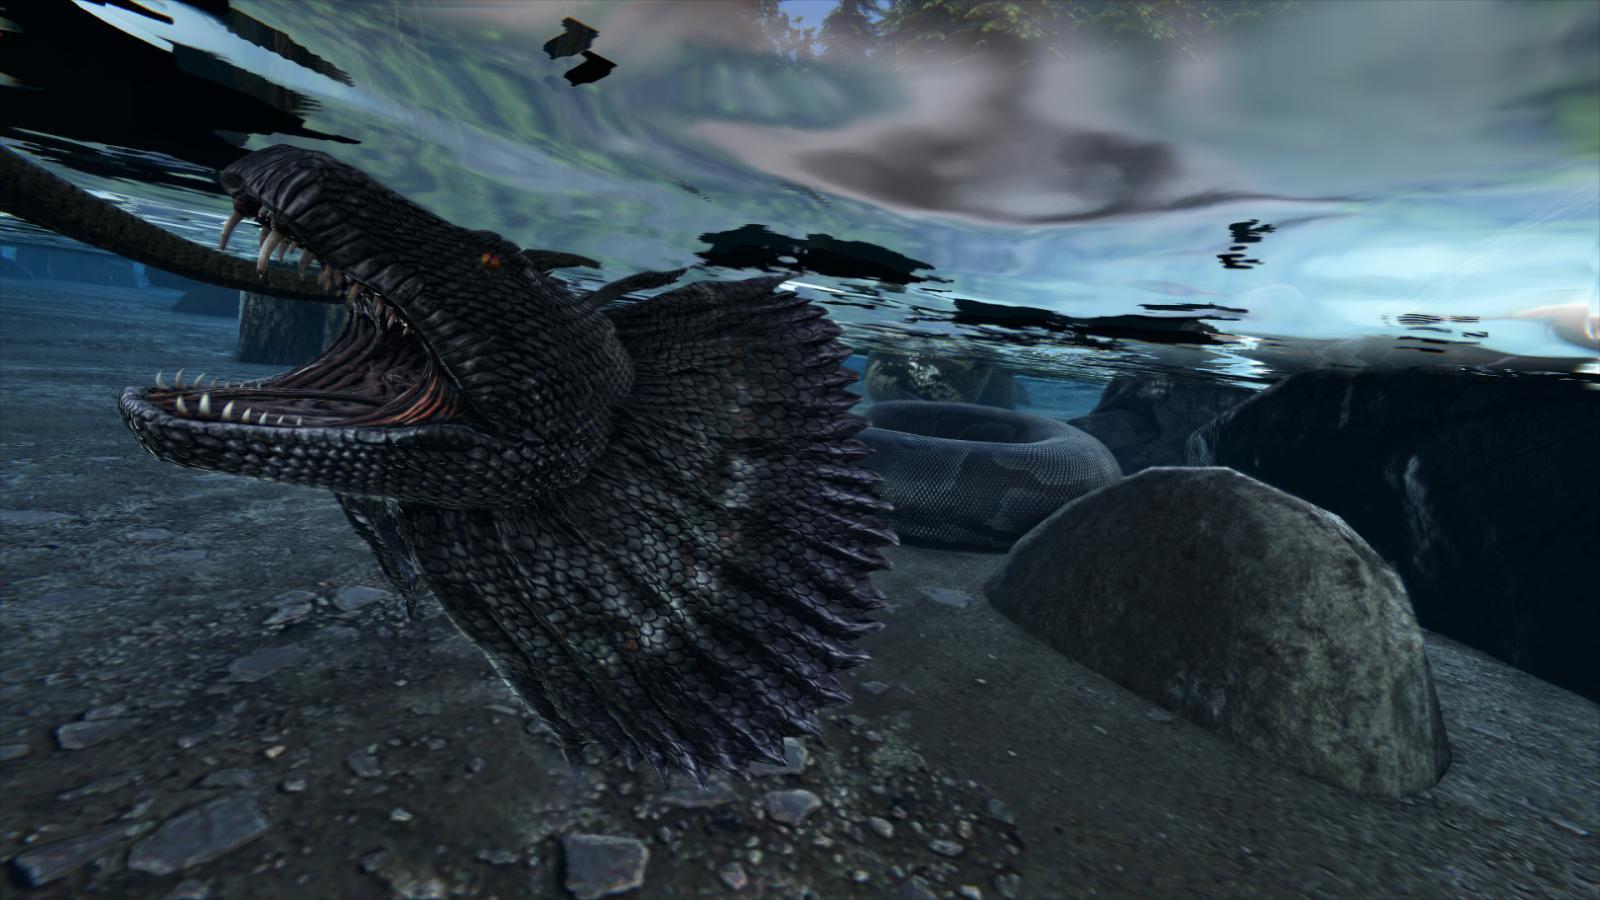 large.589e96175cde4_KISHKO-UnderwaterPredator-8xsta.jpg